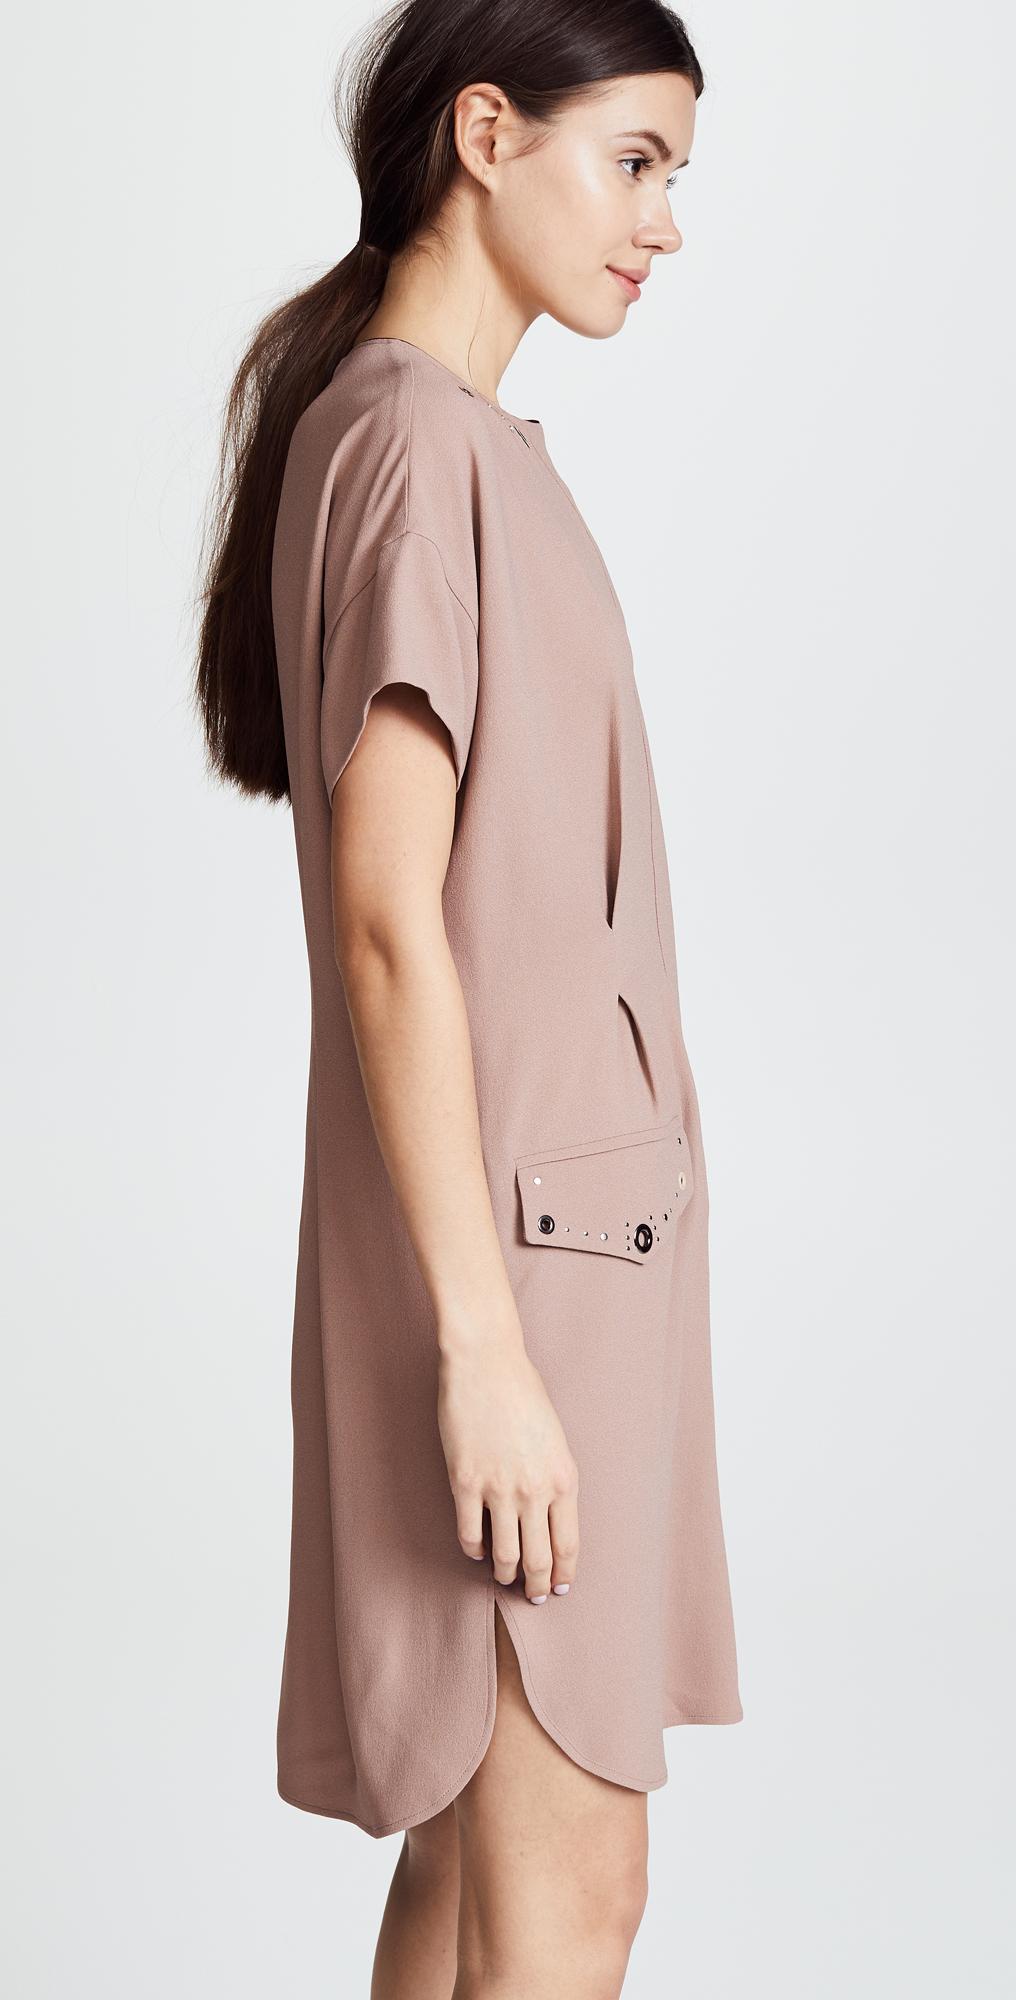 5a1d8fa6c1b3d Belstaff Darcie Shirtdress